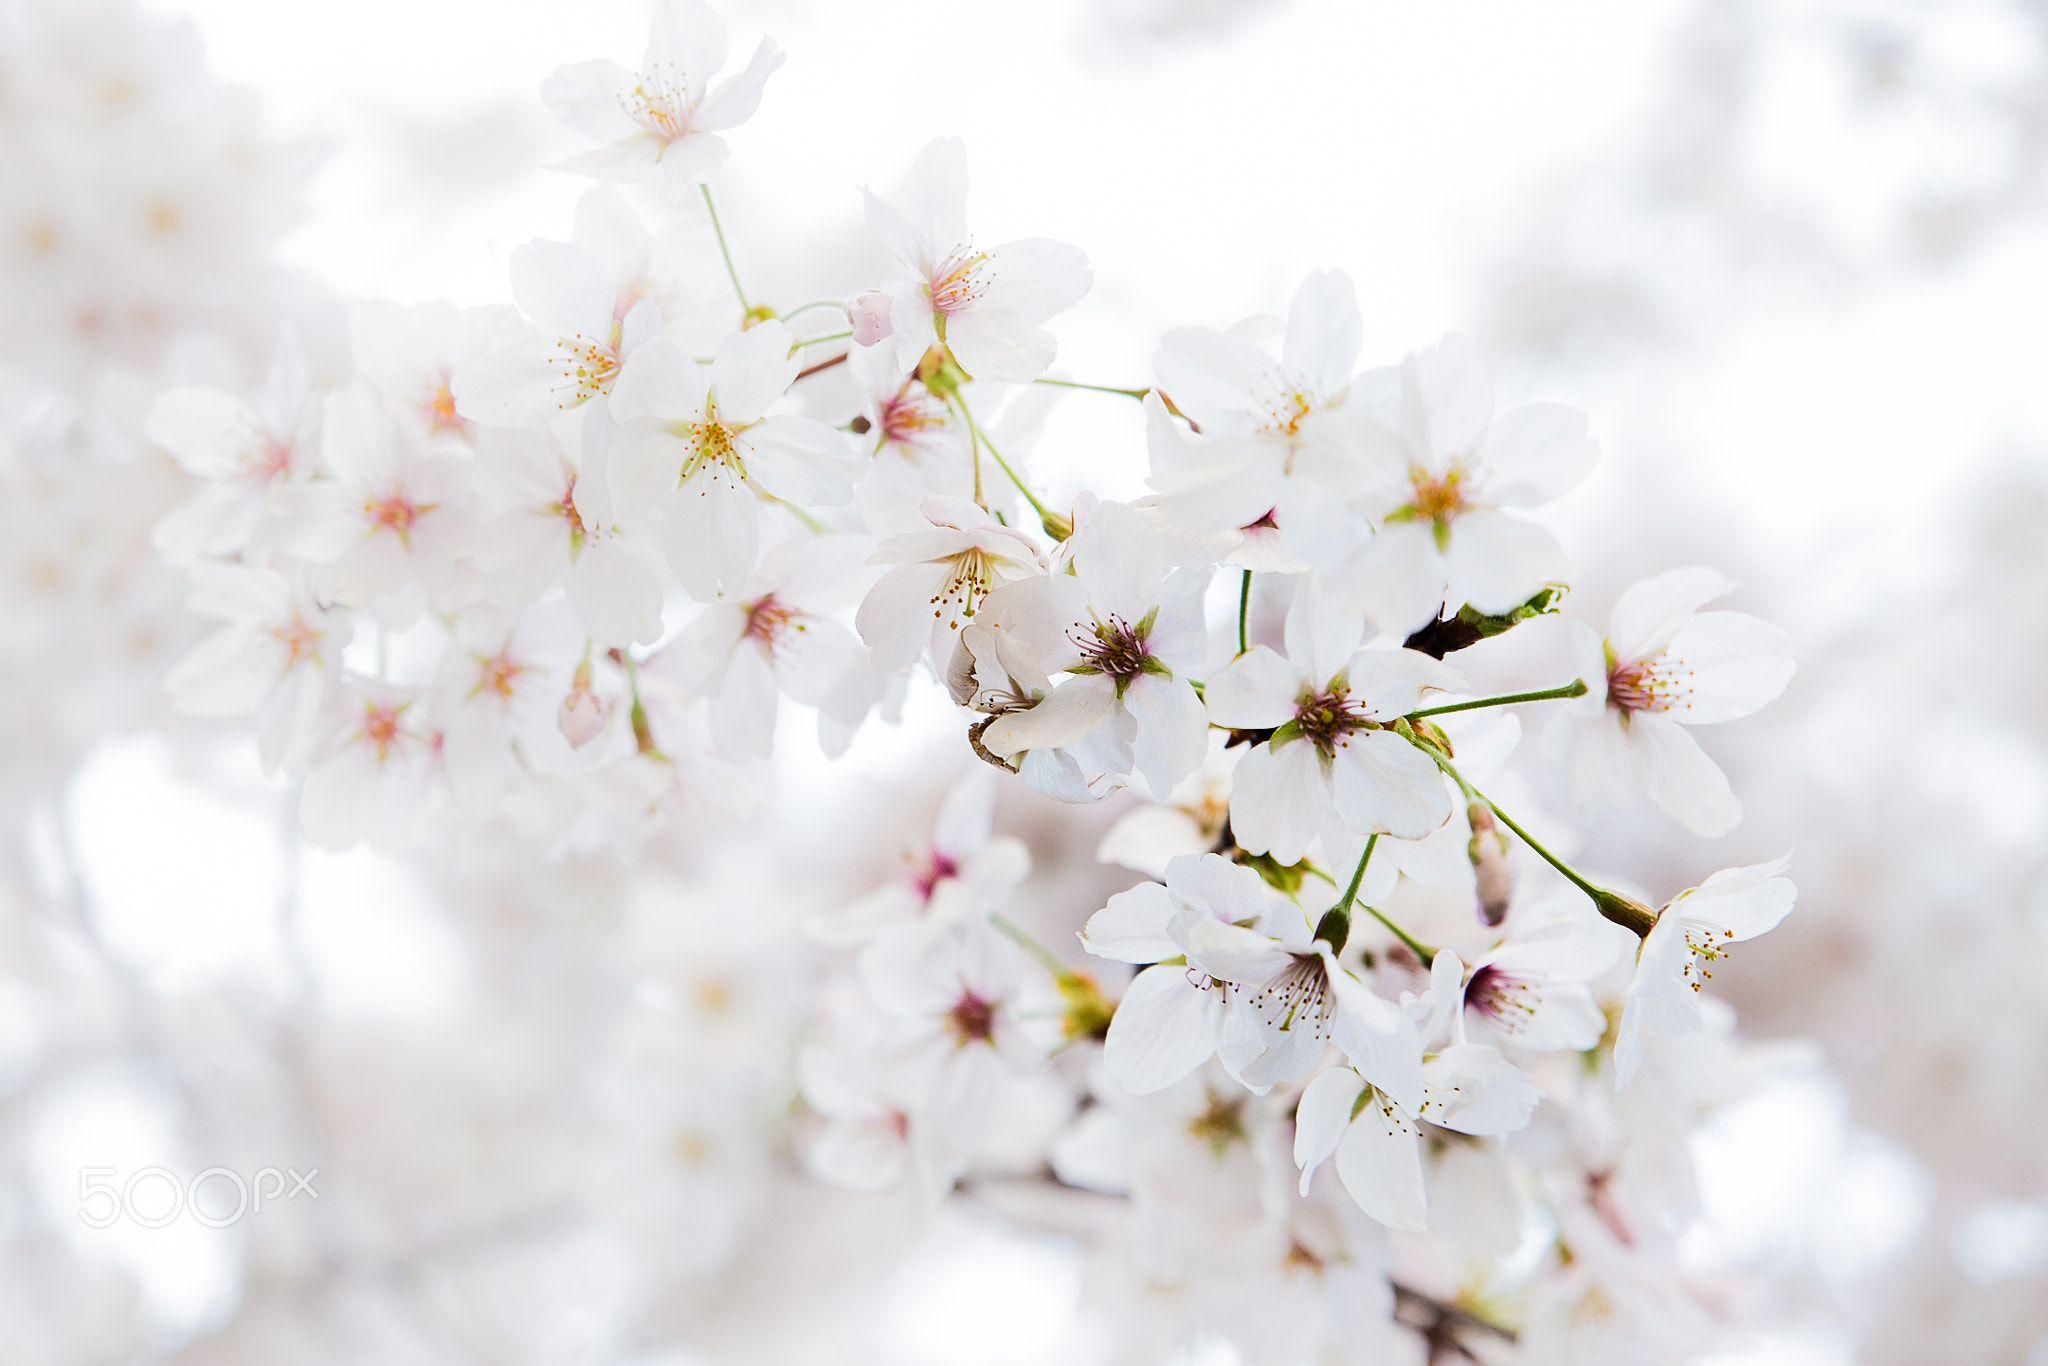 Cherry Blossom Null White Cherry Blossom Blossom Cherry Blossom